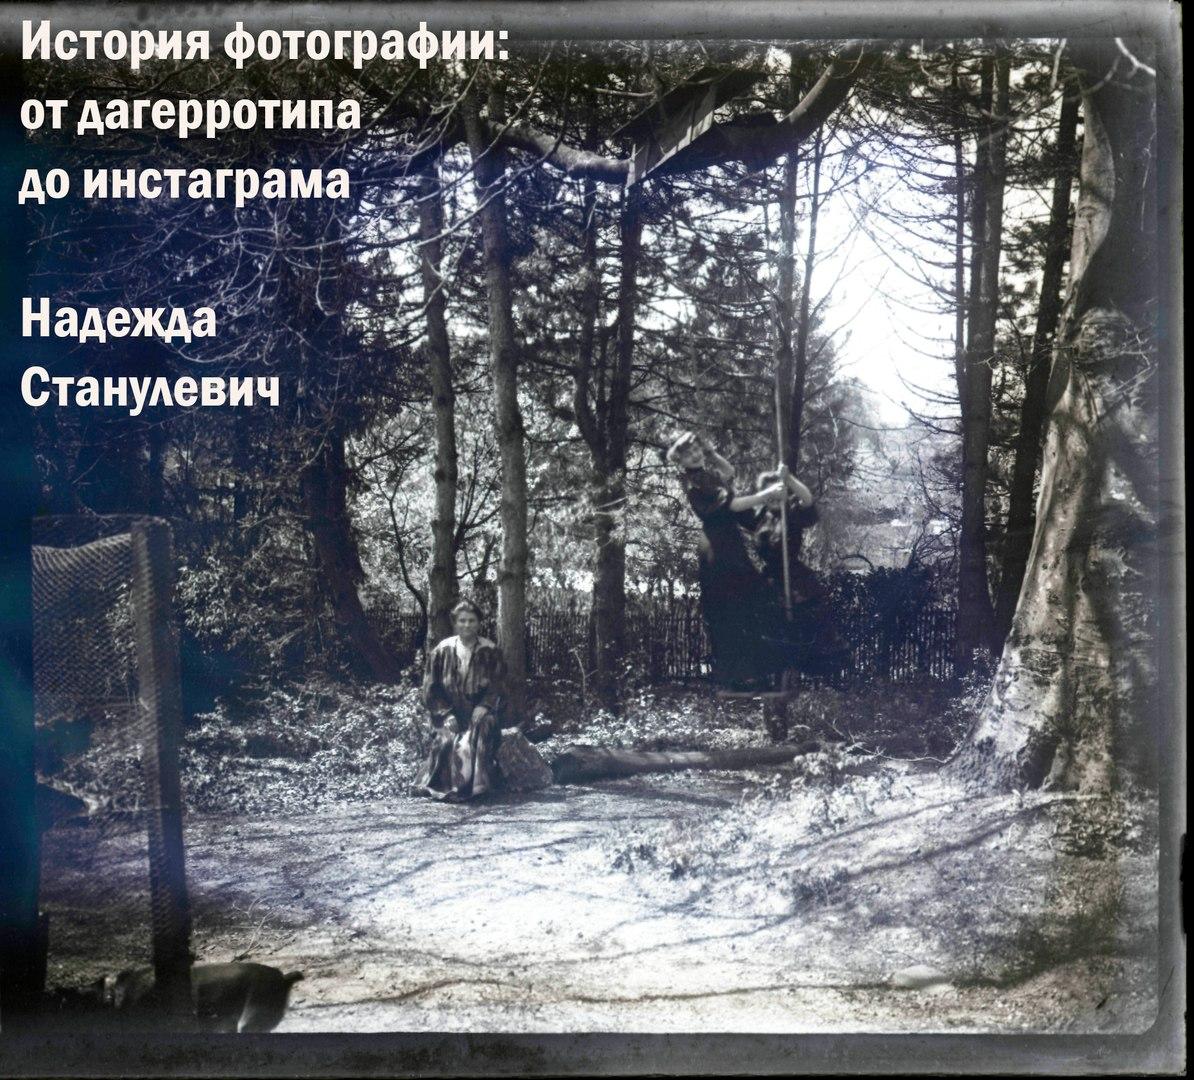 "Курс из 9 лекций.""От дагерротипа до инстаграма"", источник фото: vk.com"